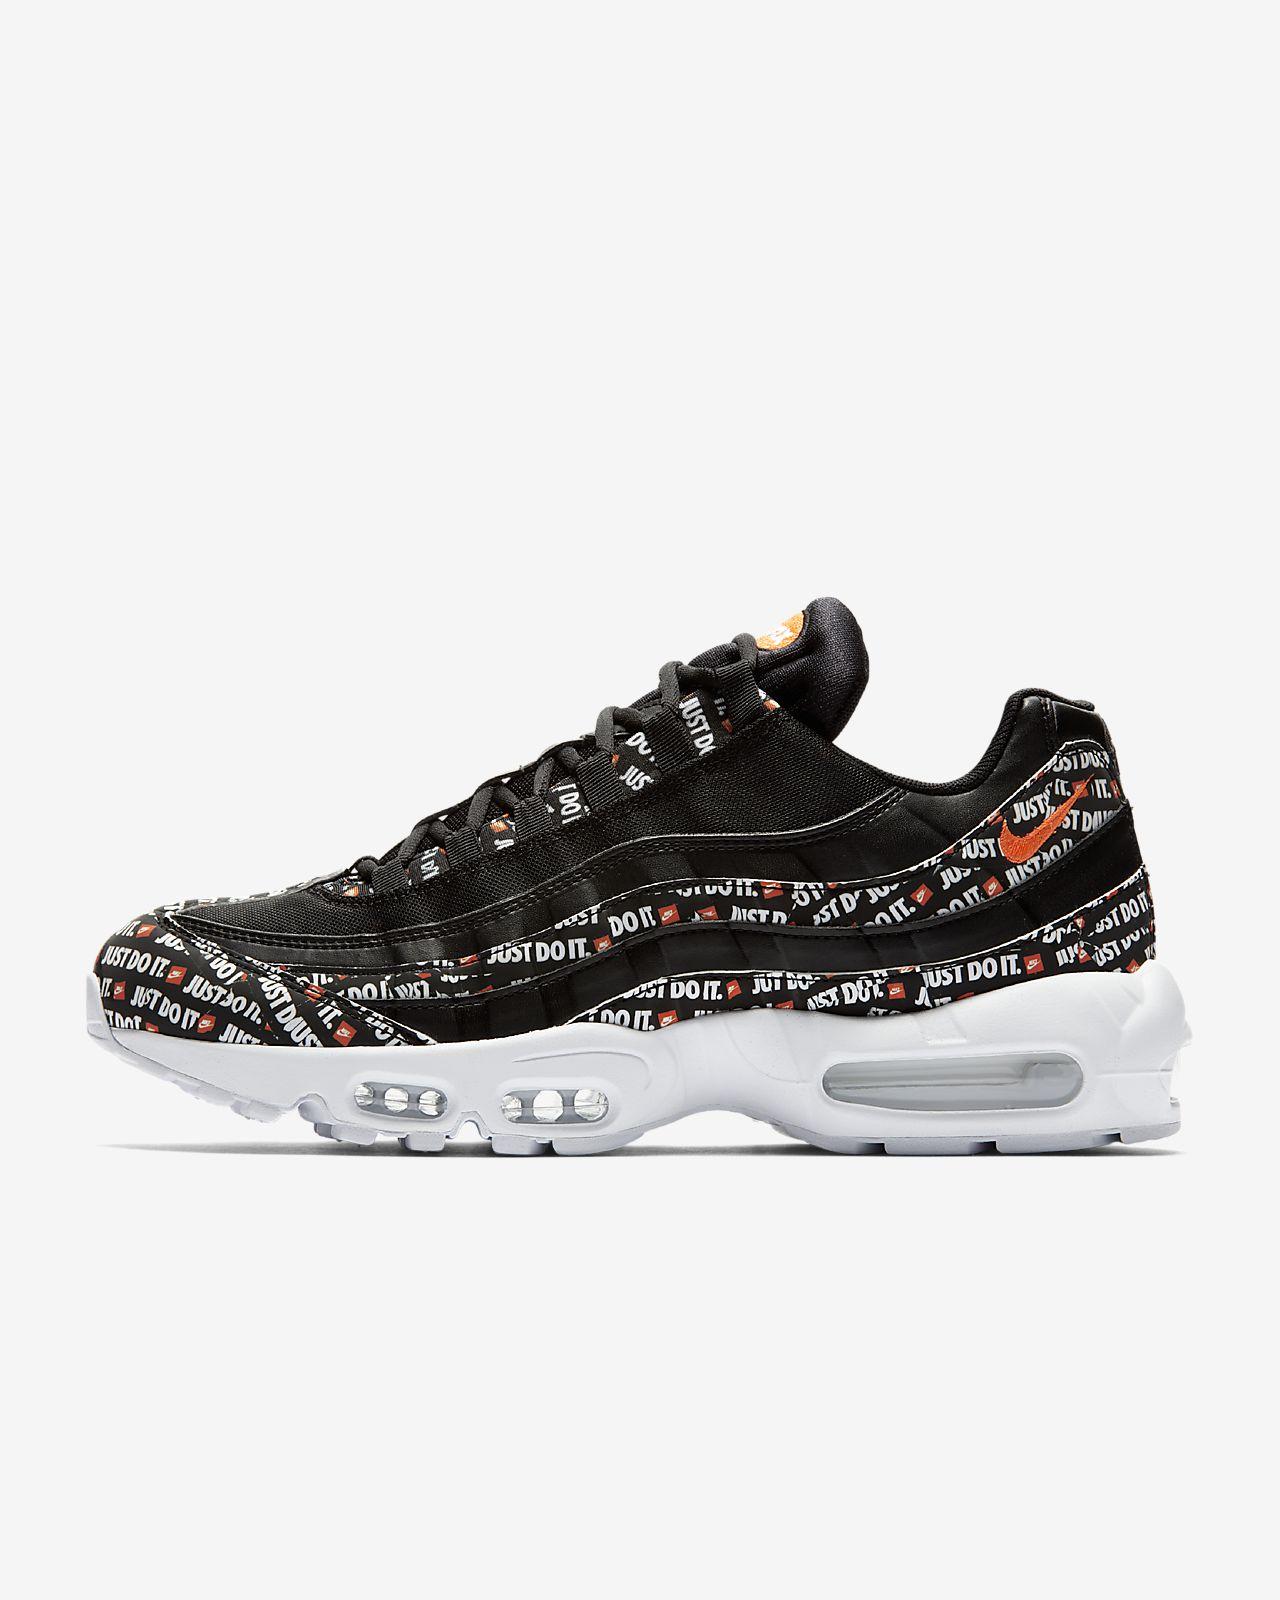 best service 9a970 6a8e3 ... Nike Air Max 95 SE-sko til mænd